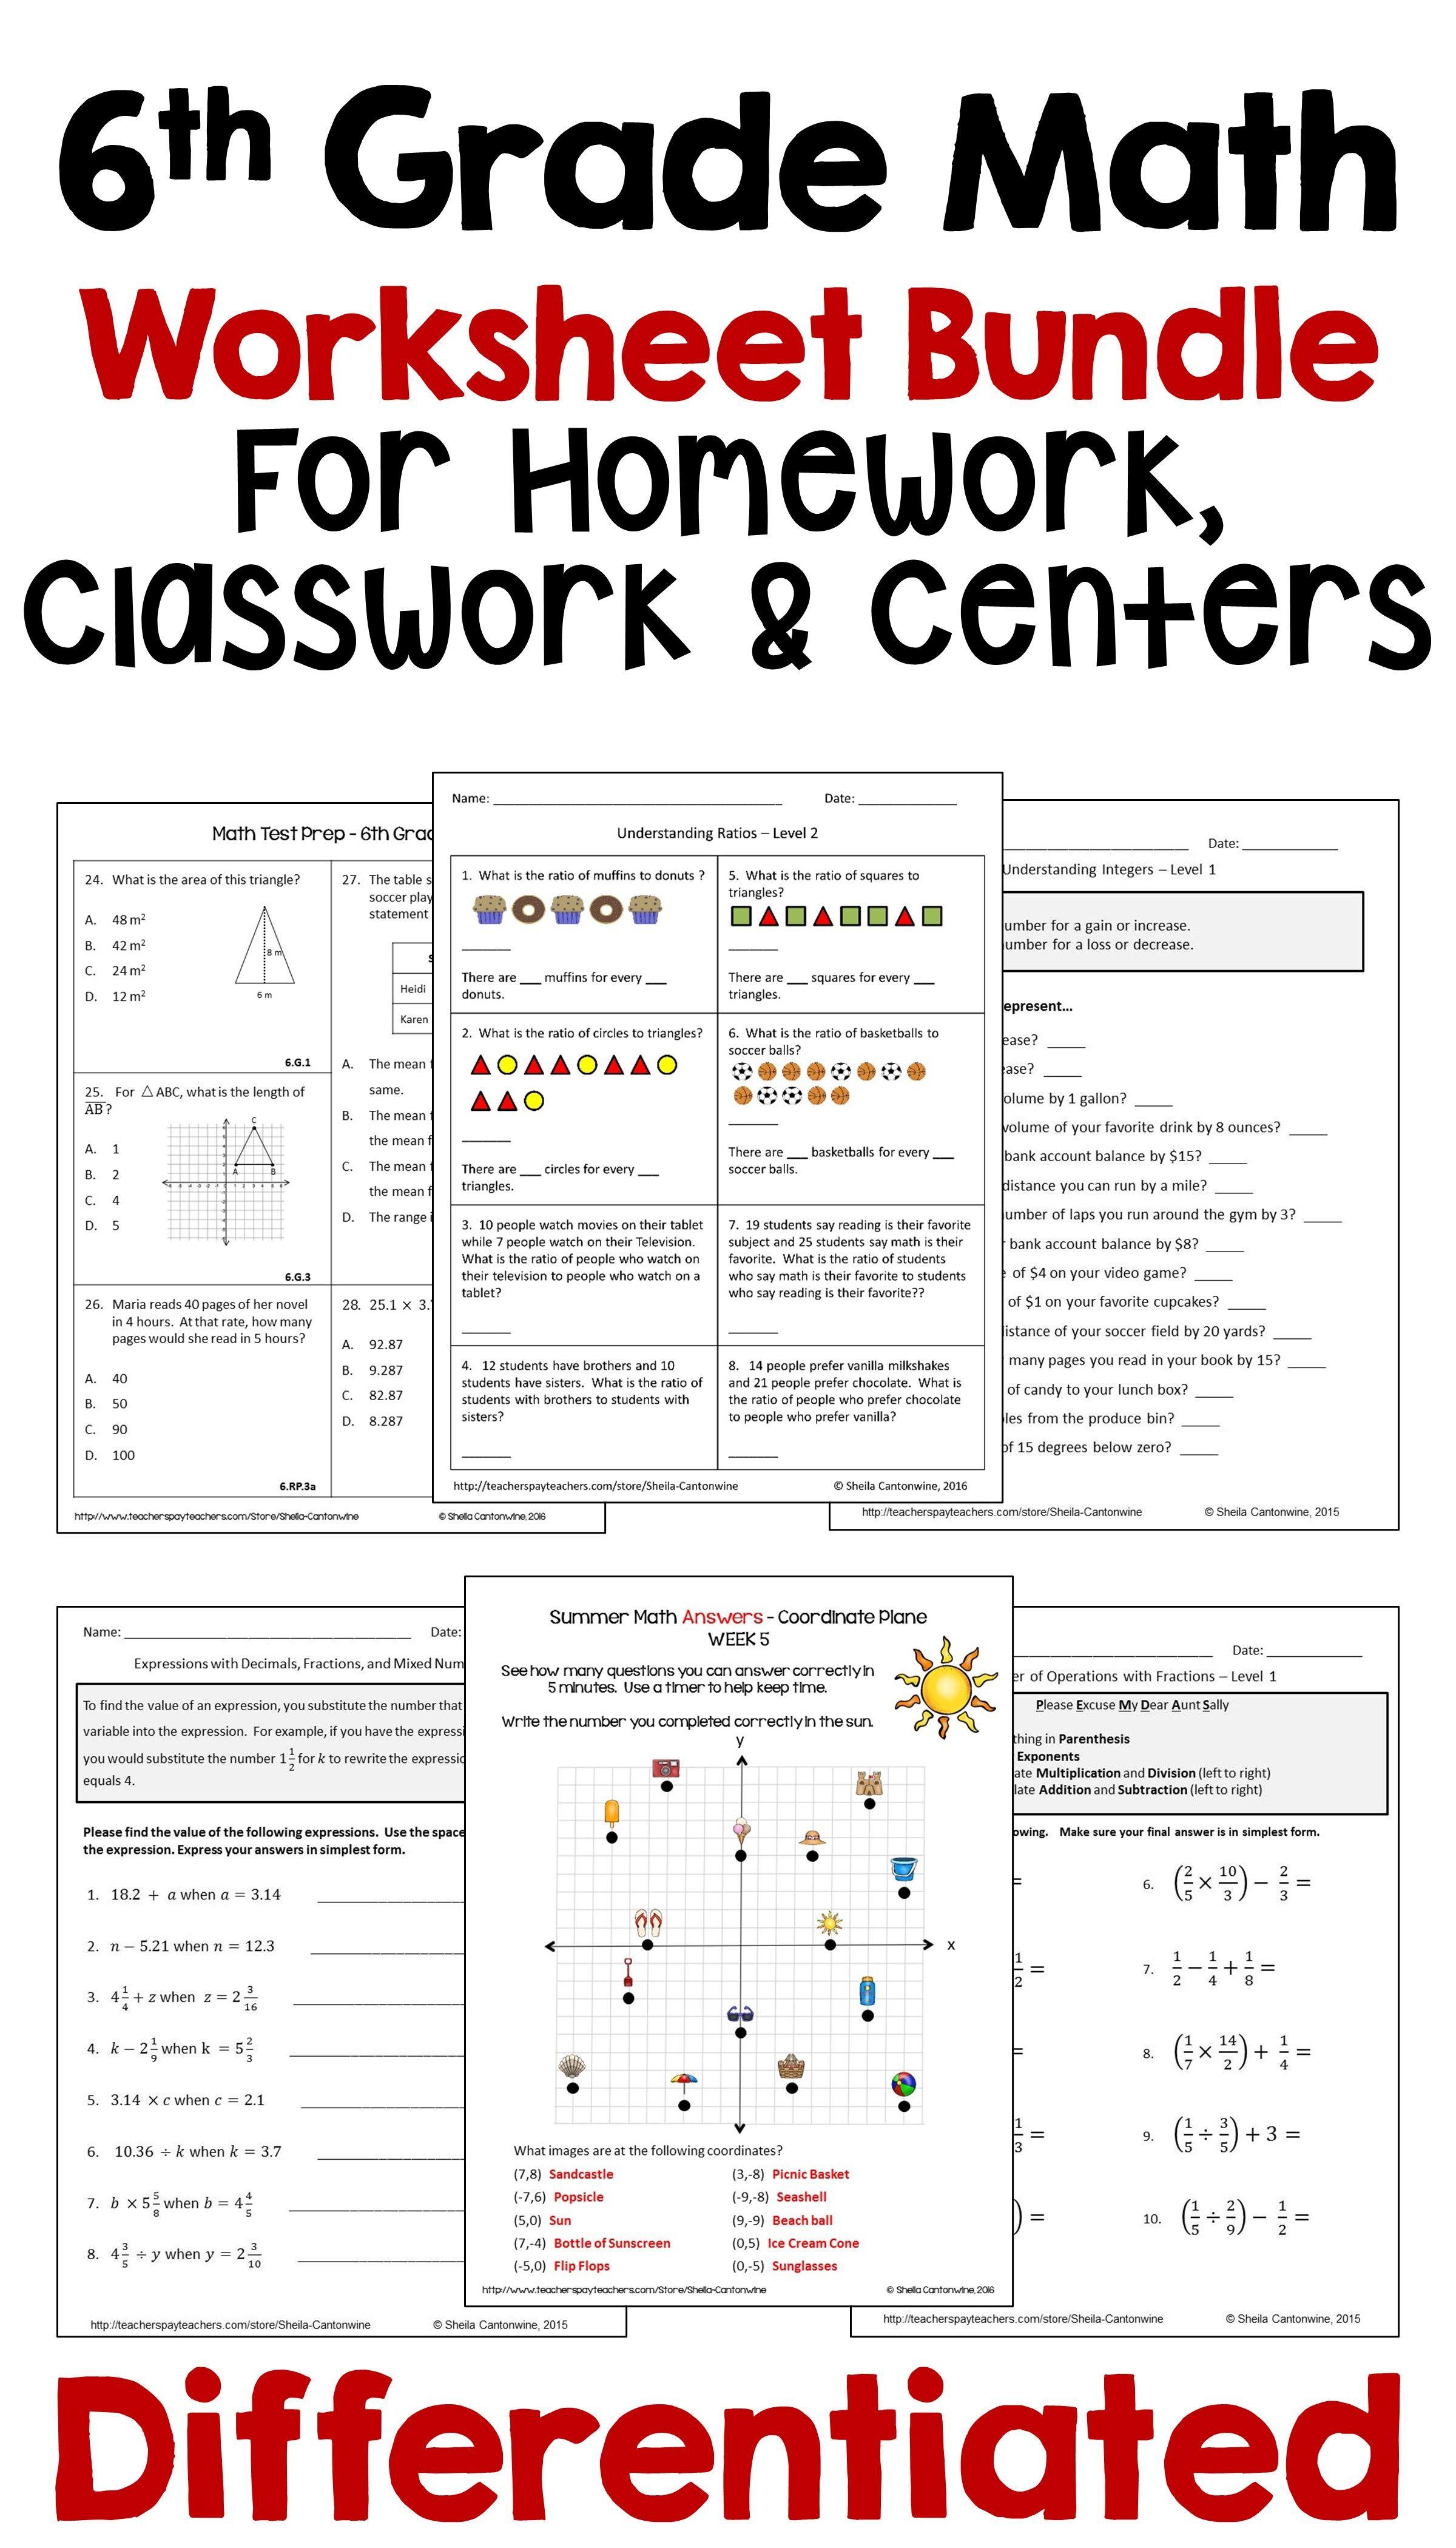 hight resolution of 6th Grade Math Worksheet Bundle for Homework